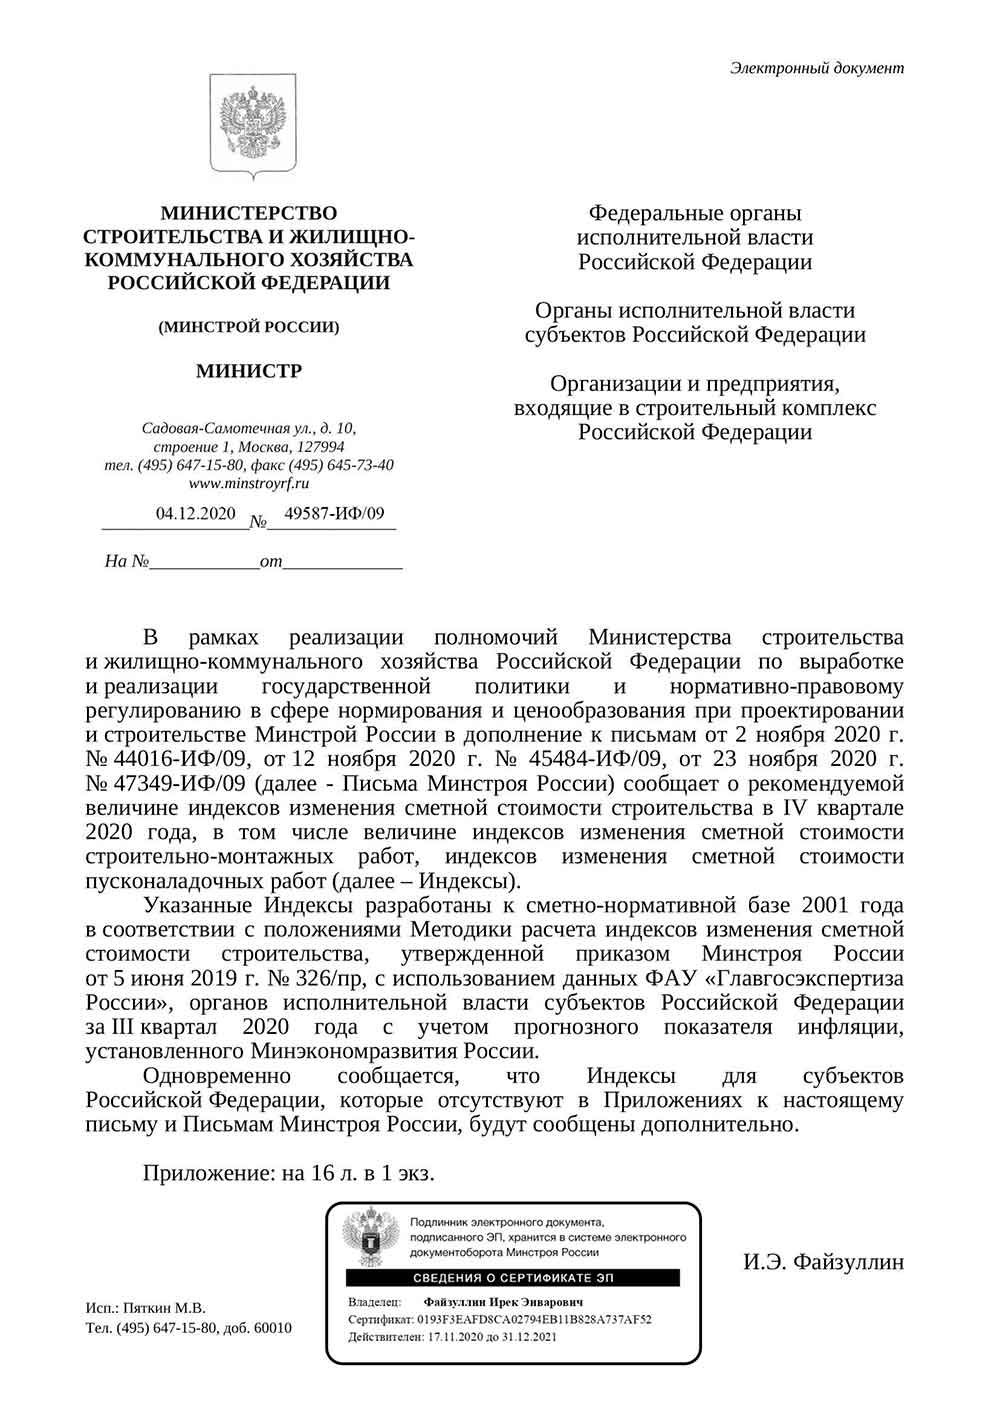 Письмо Минстроя РФ №49587-ИФ/09 от 04.12.2020 г.